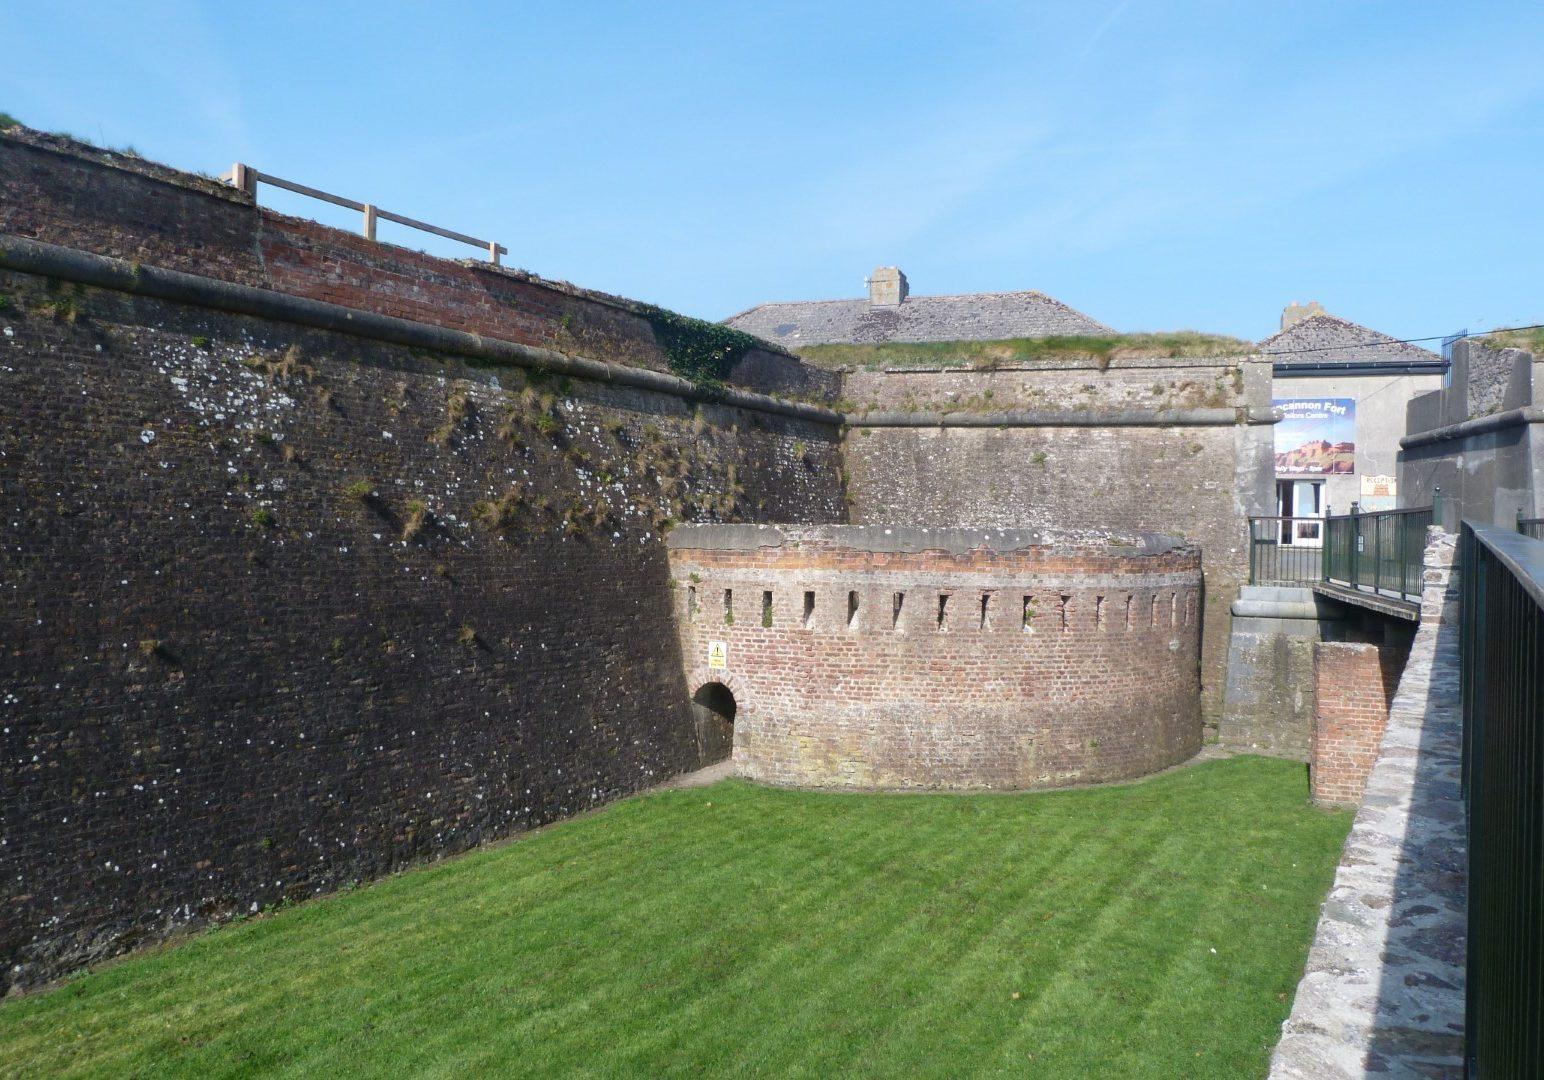 The Moat at Duncannon Fort, Duncannon Wexford